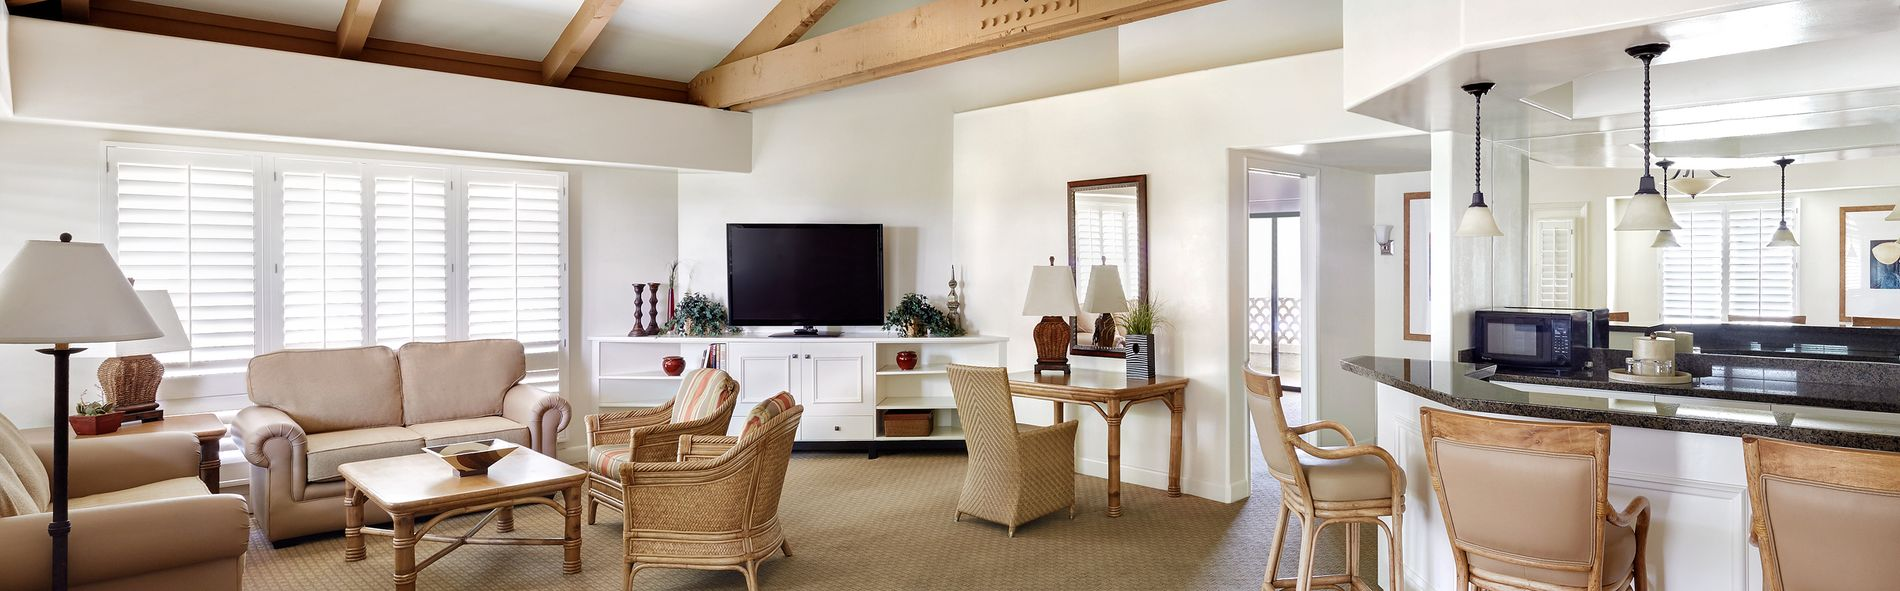 Suites in Phoenix AZ  Arizona Grand Resort  Spa